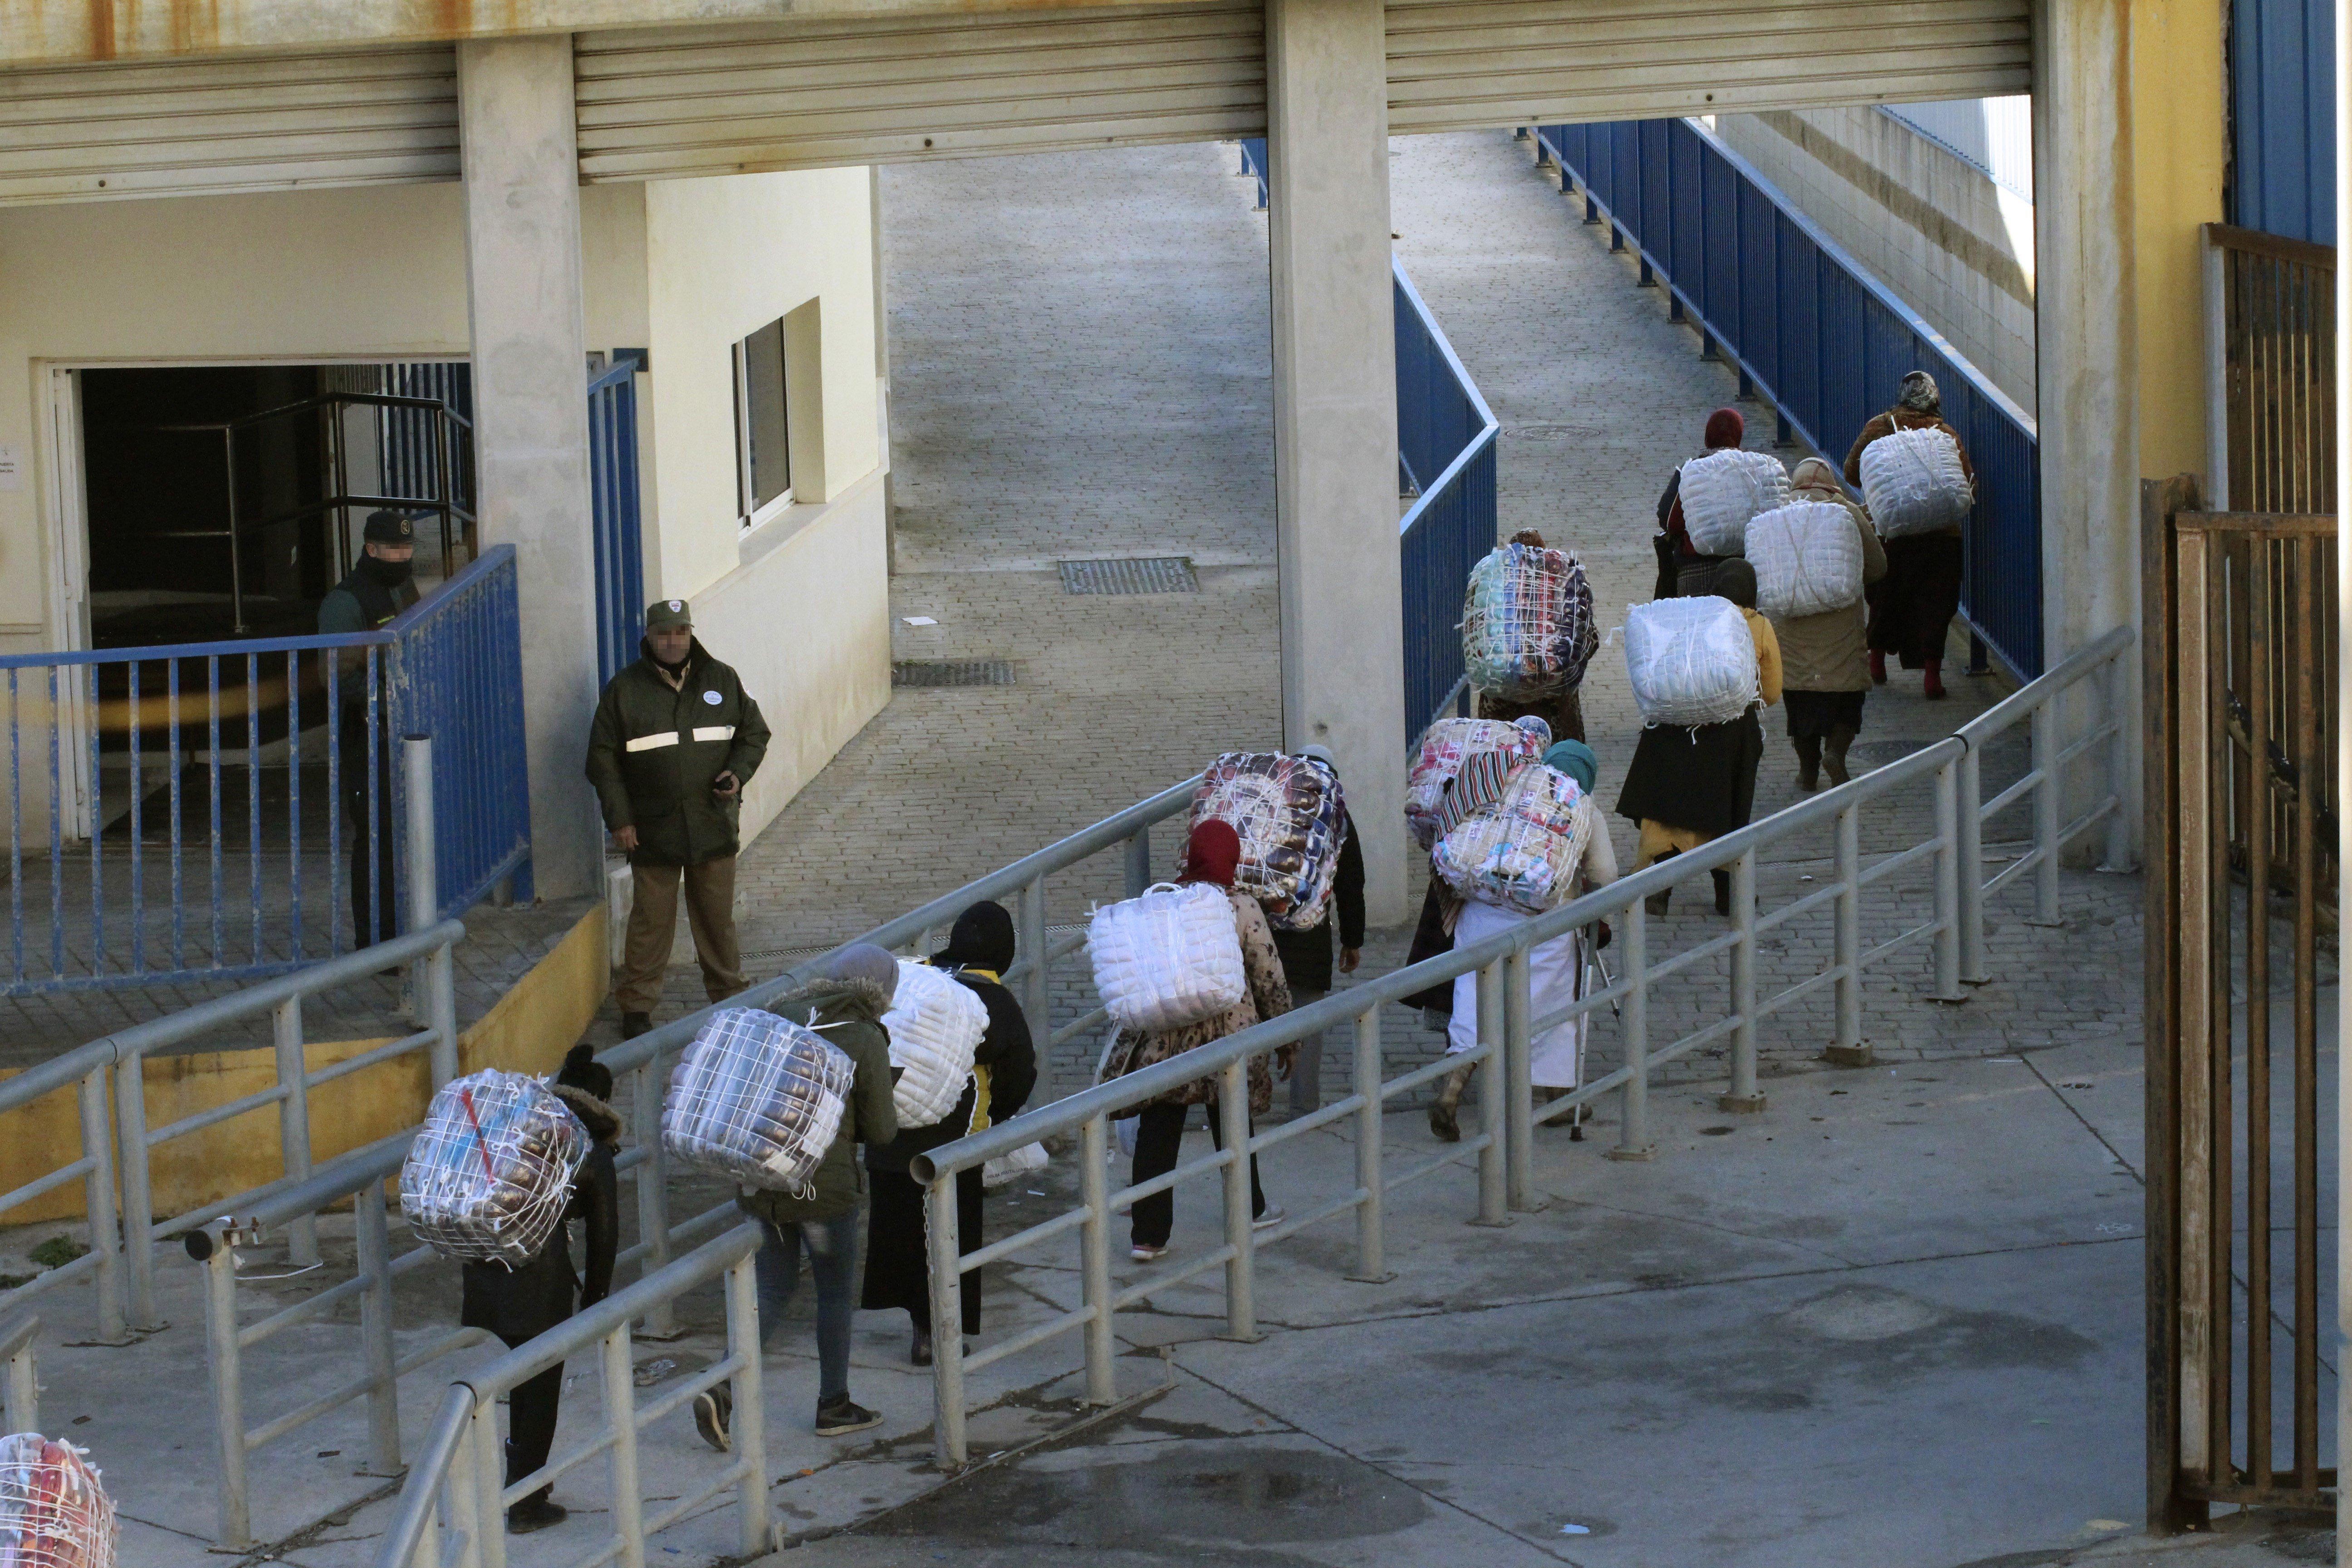 Dues dones mortes en un devessall en intentar entrar a Ceuta. /REDUAN